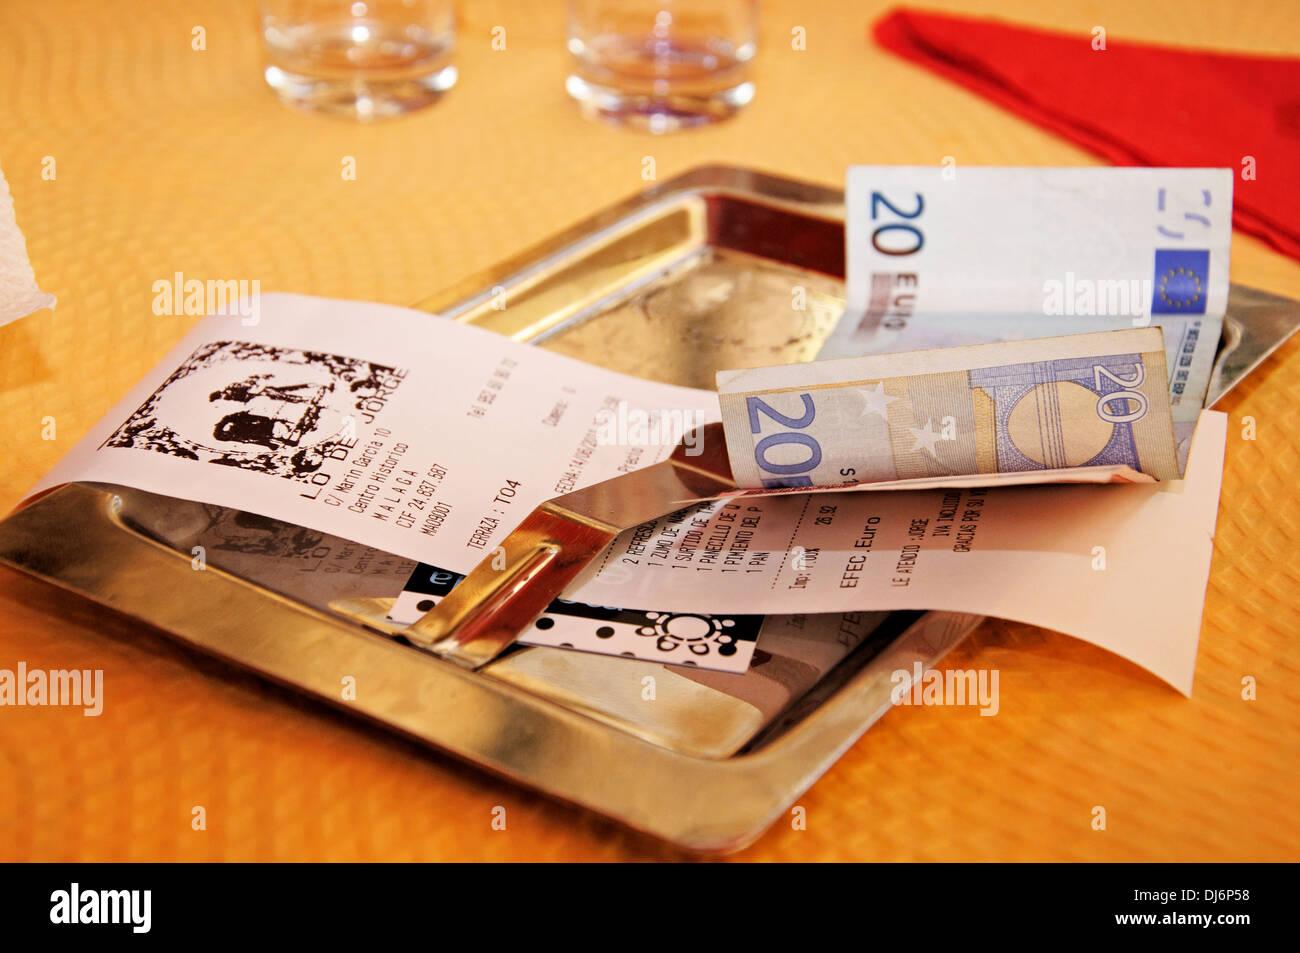 Tapas receipt in a city centre Tapas Bar, Malaga, Costa del Sol, Malaga Province, Andalusia, Spain, Western Europe. - Stock Image